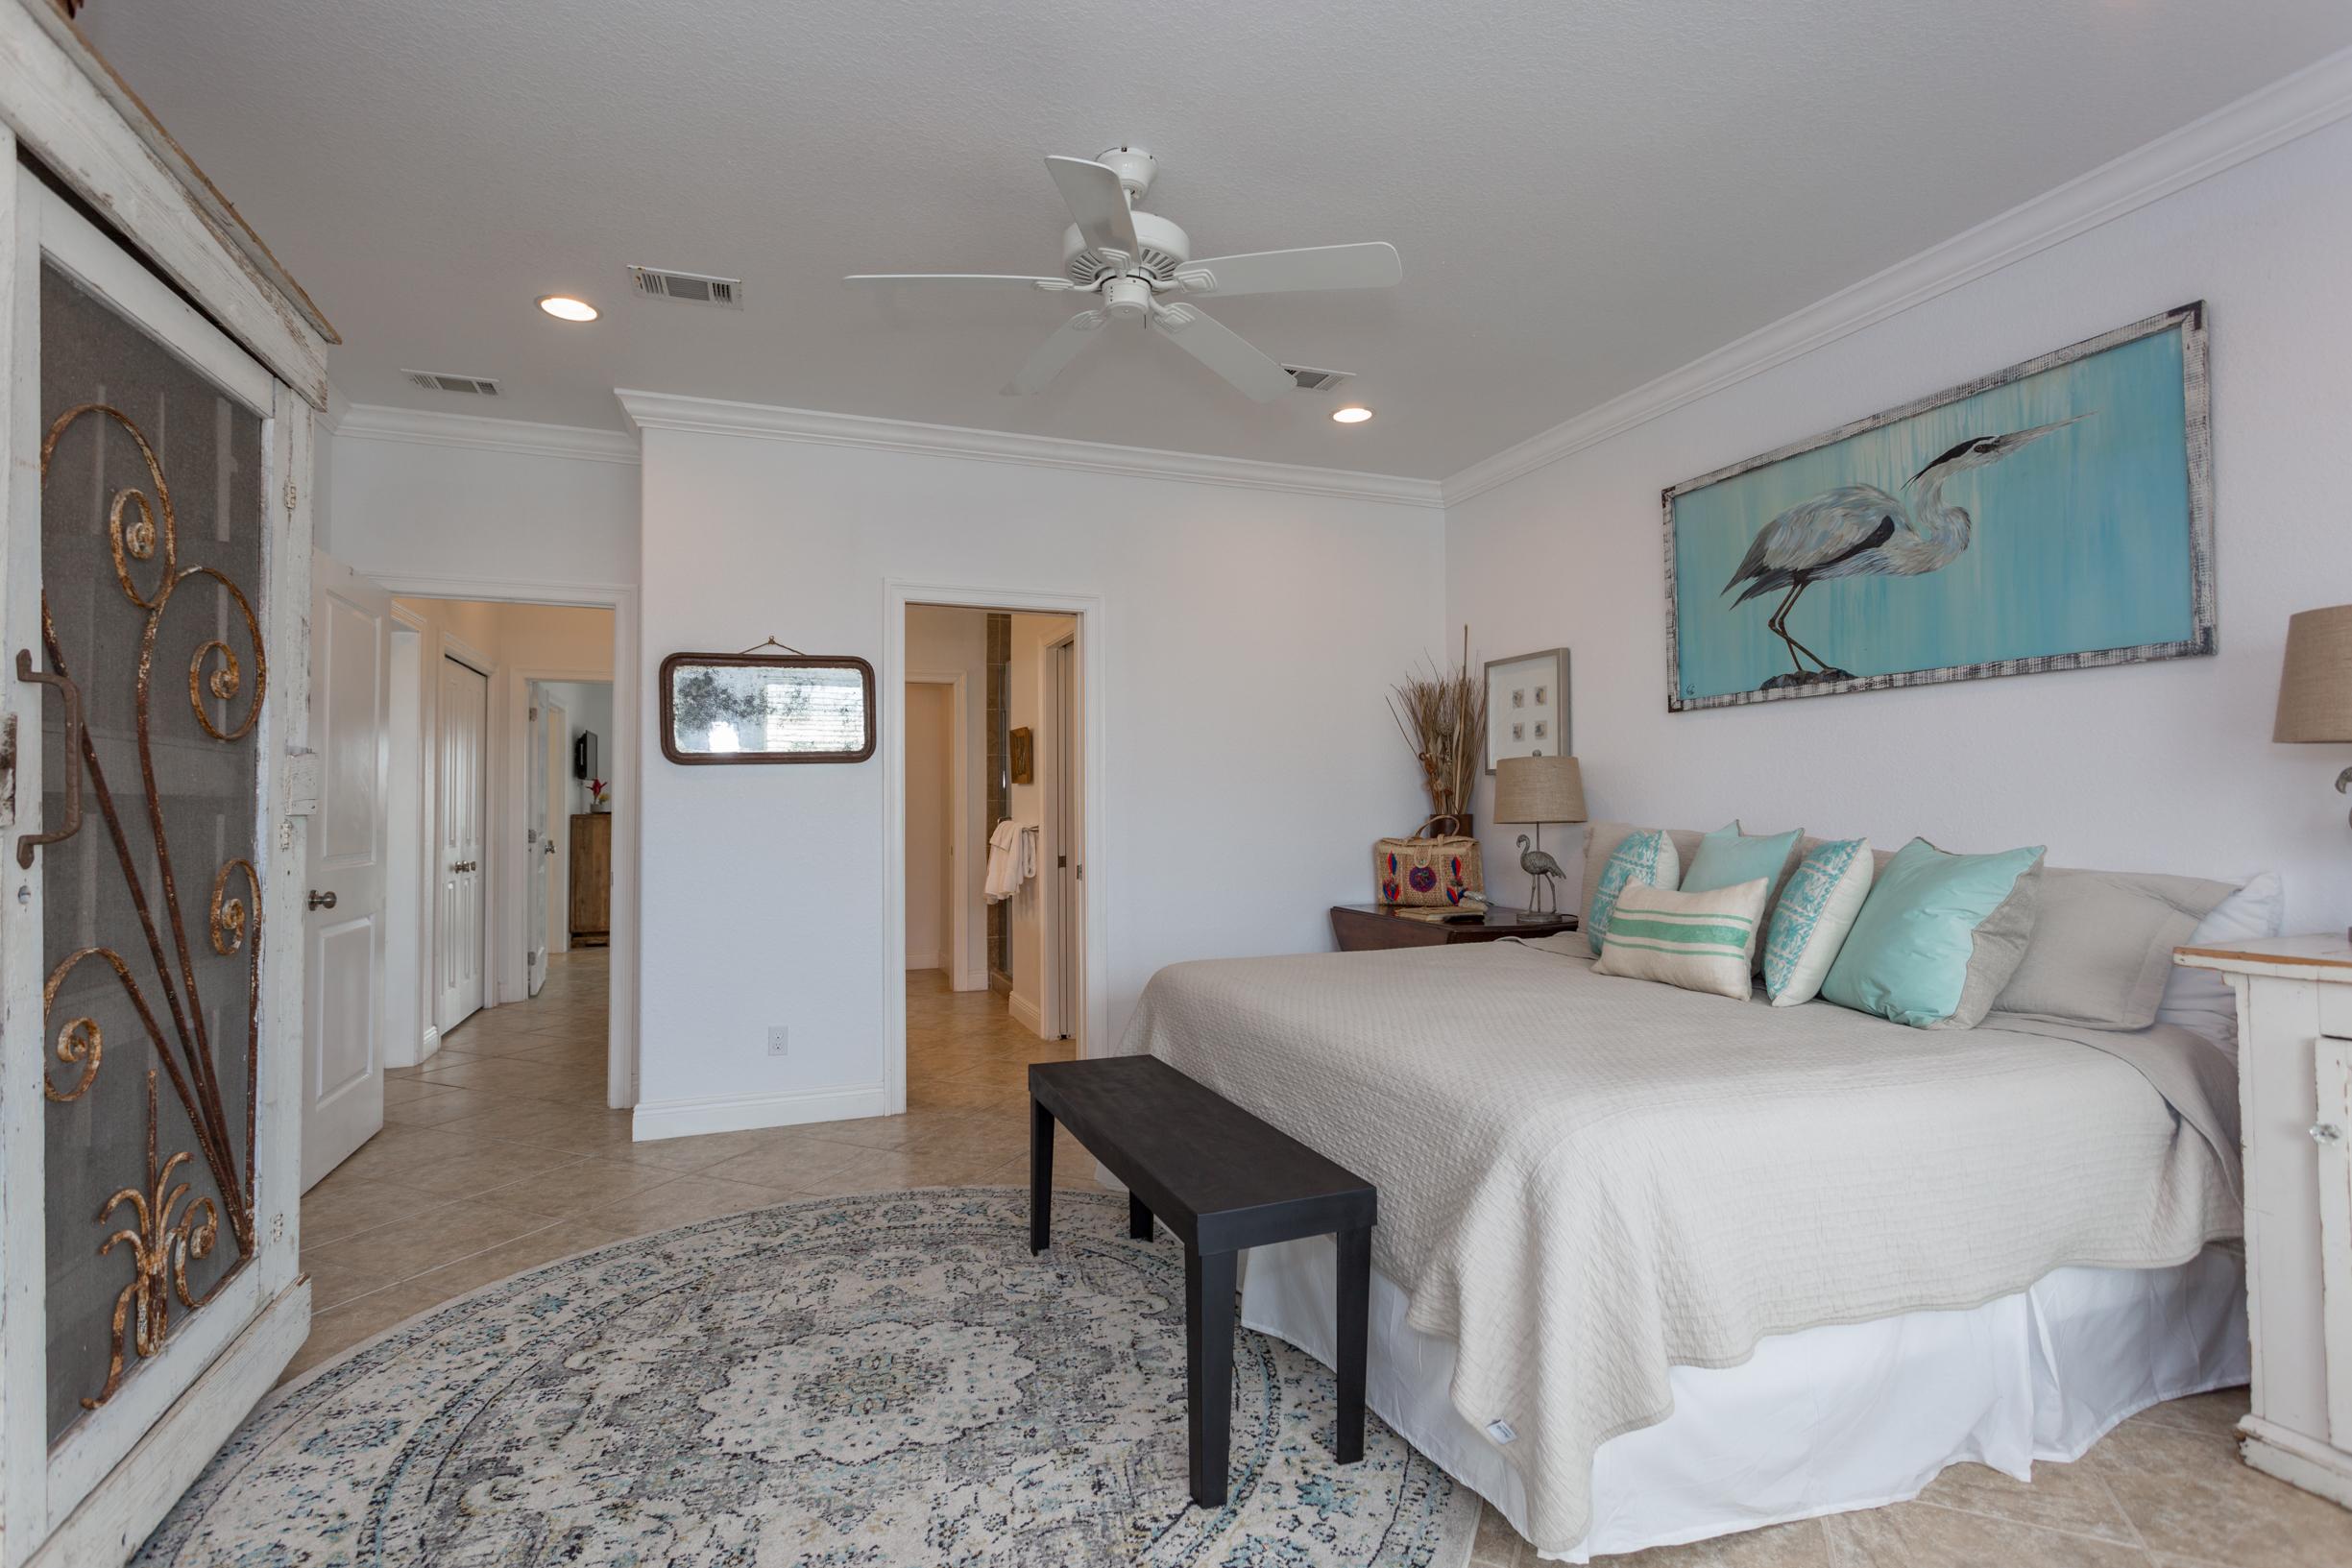 Ariola 1003 - The Starfish House House/Cottage rental in Pensacola Beach House Rentals in Pensacola Beach Florida - #18